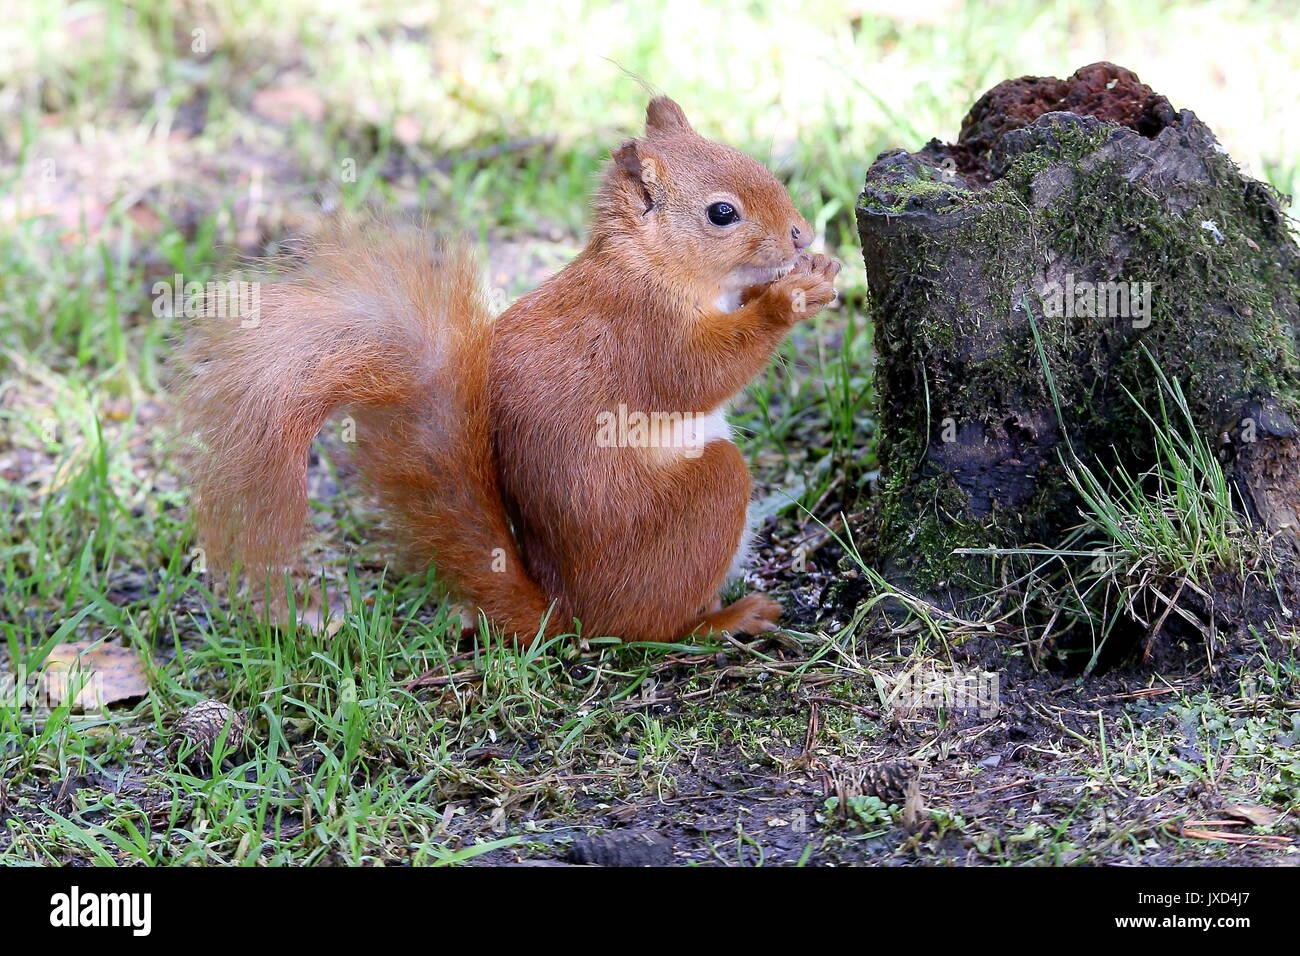 drey squirrel stockfotos drey squirrel bilder alamy. Black Bedroom Furniture Sets. Home Design Ideas